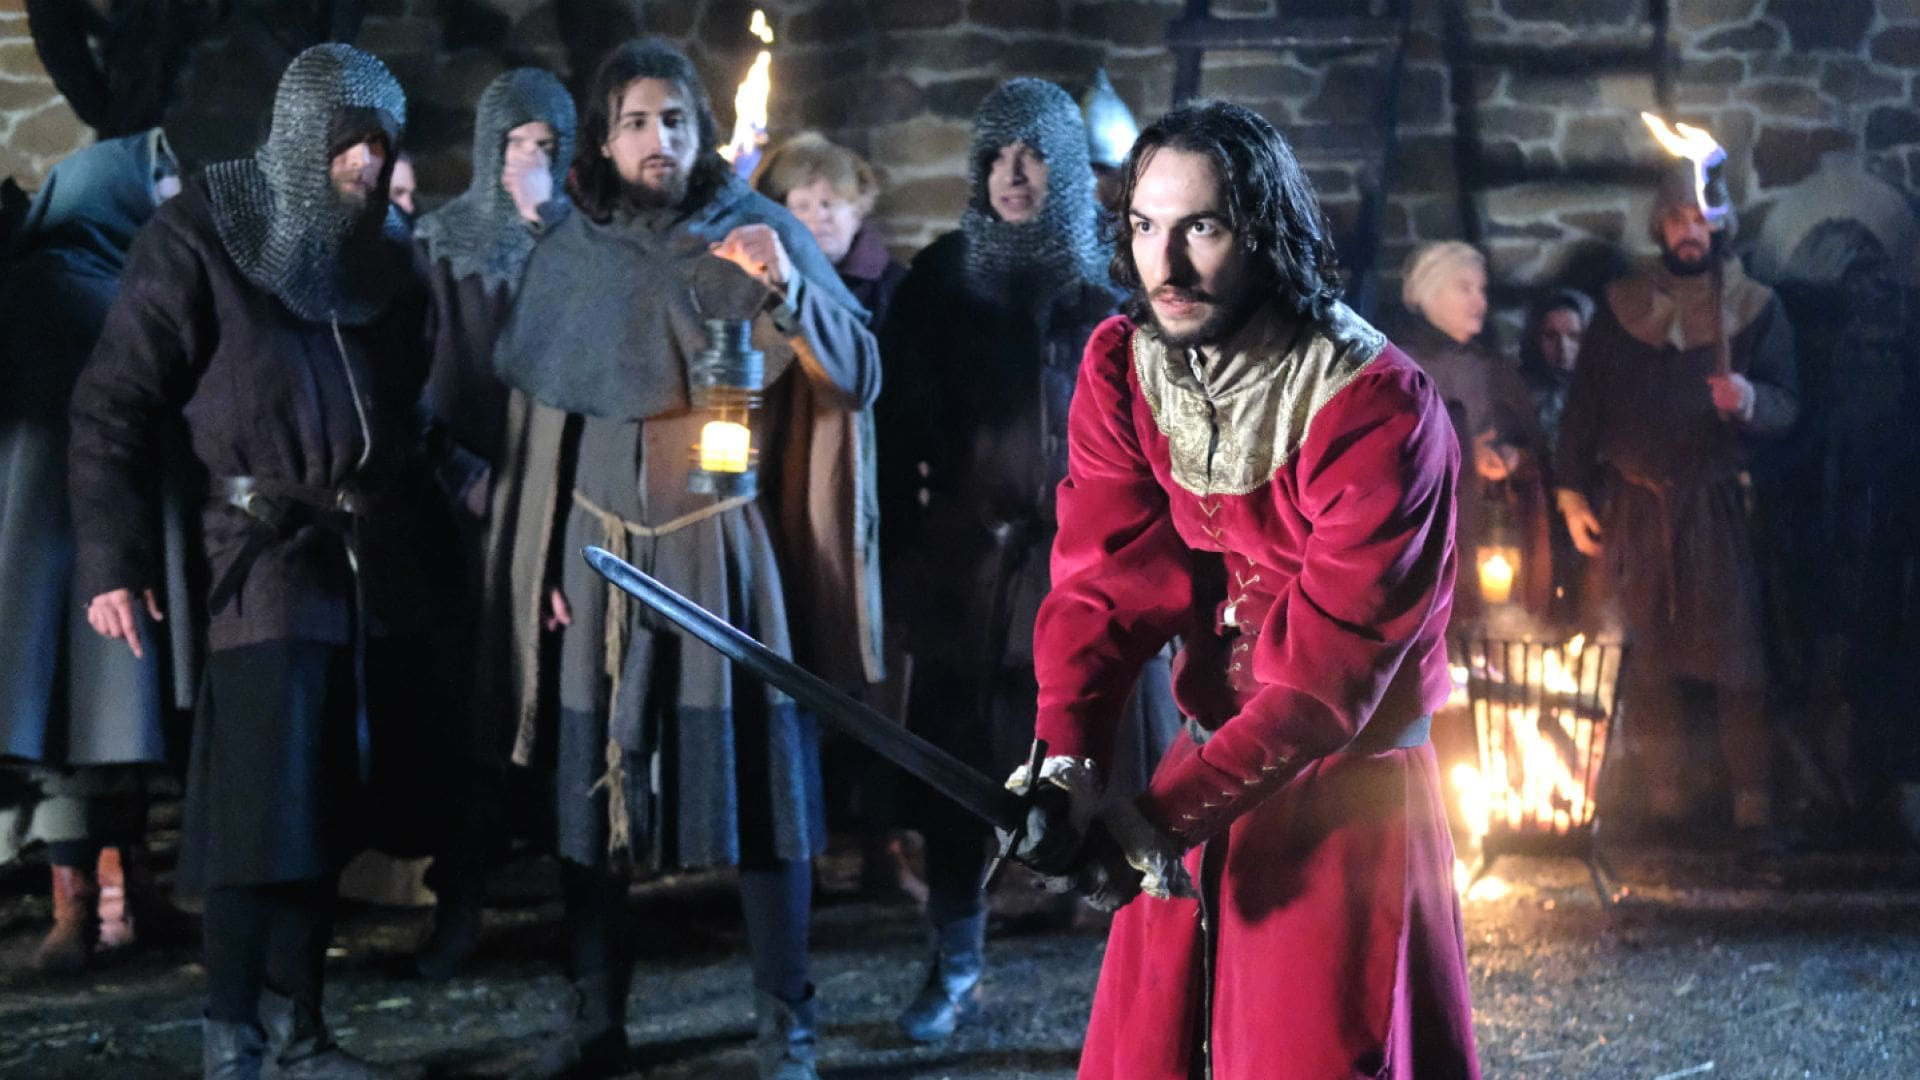 Псковитяне оставили гродненского наместника своим князем